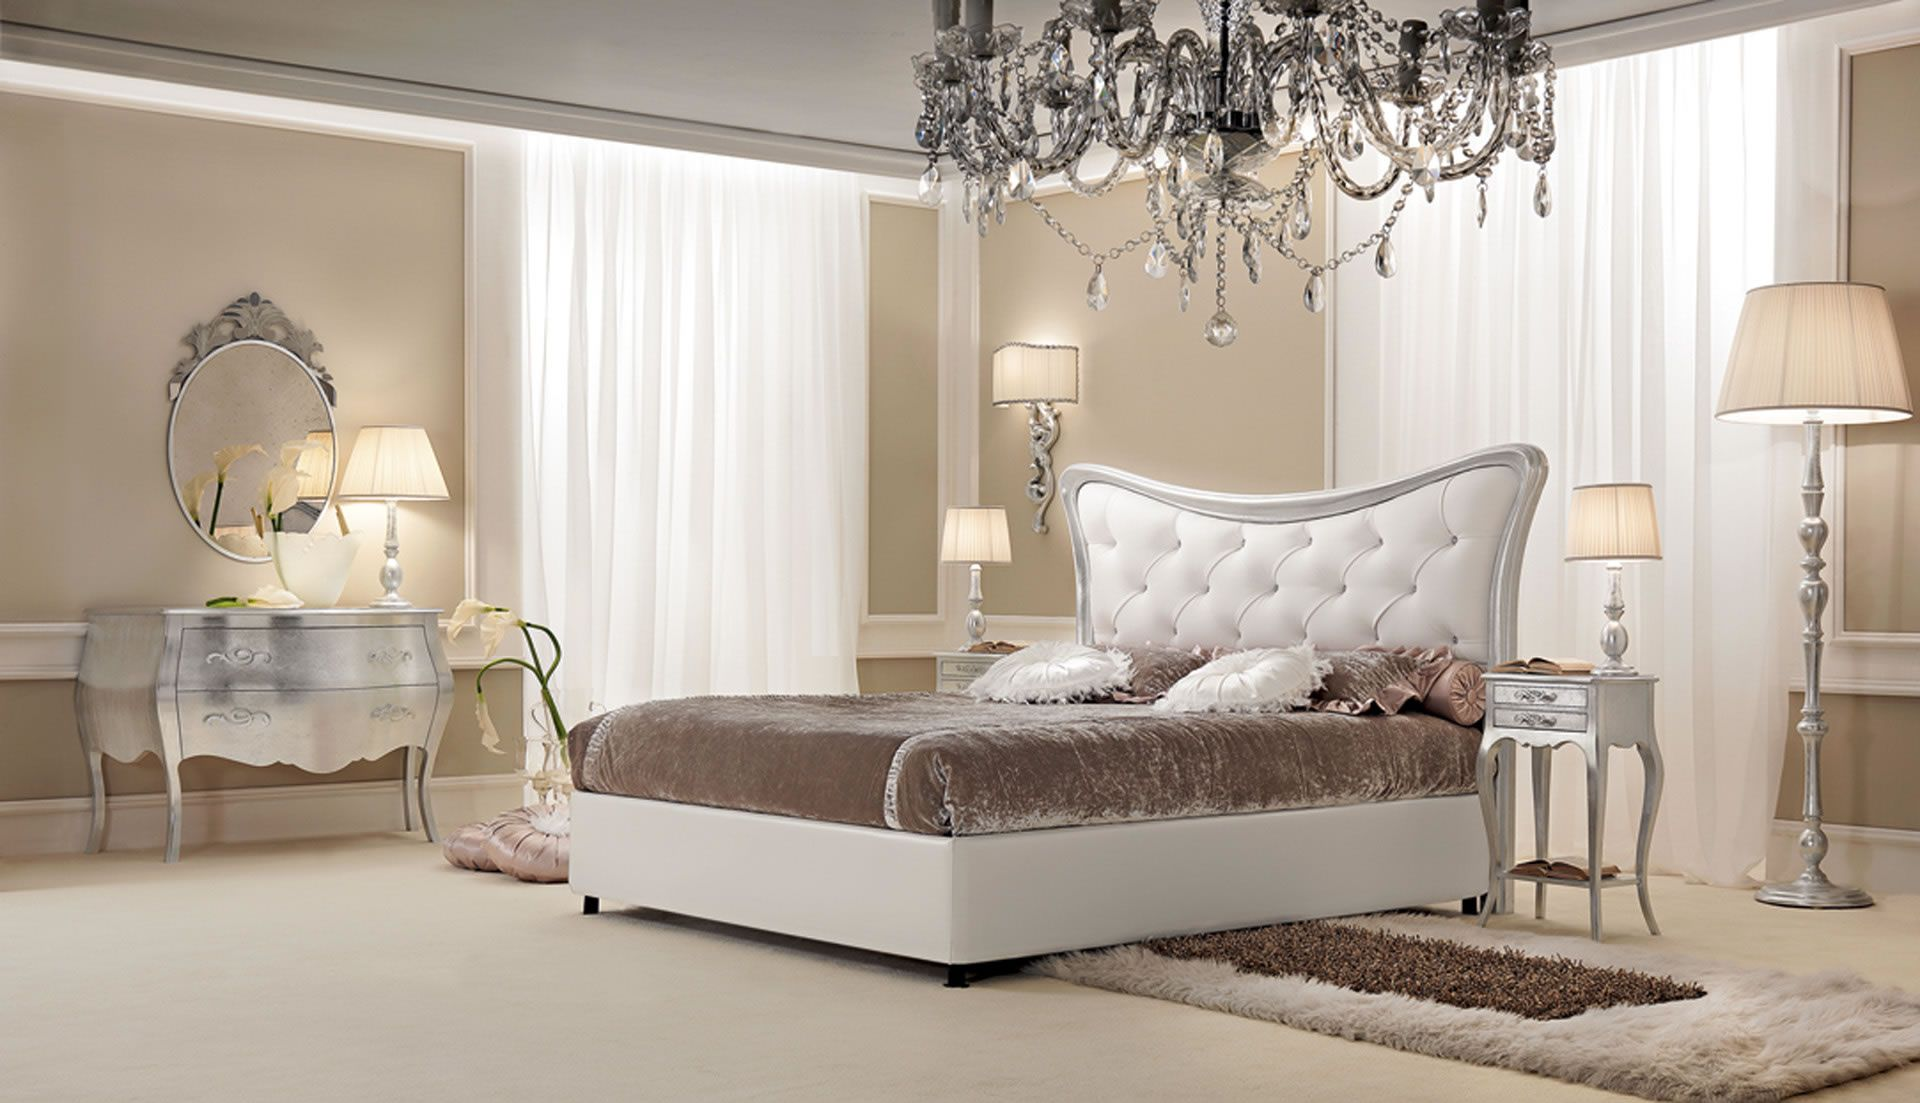 Gotha Mobili ~ Mobili di lusso glamour zona notte gotha luxury rtg glam